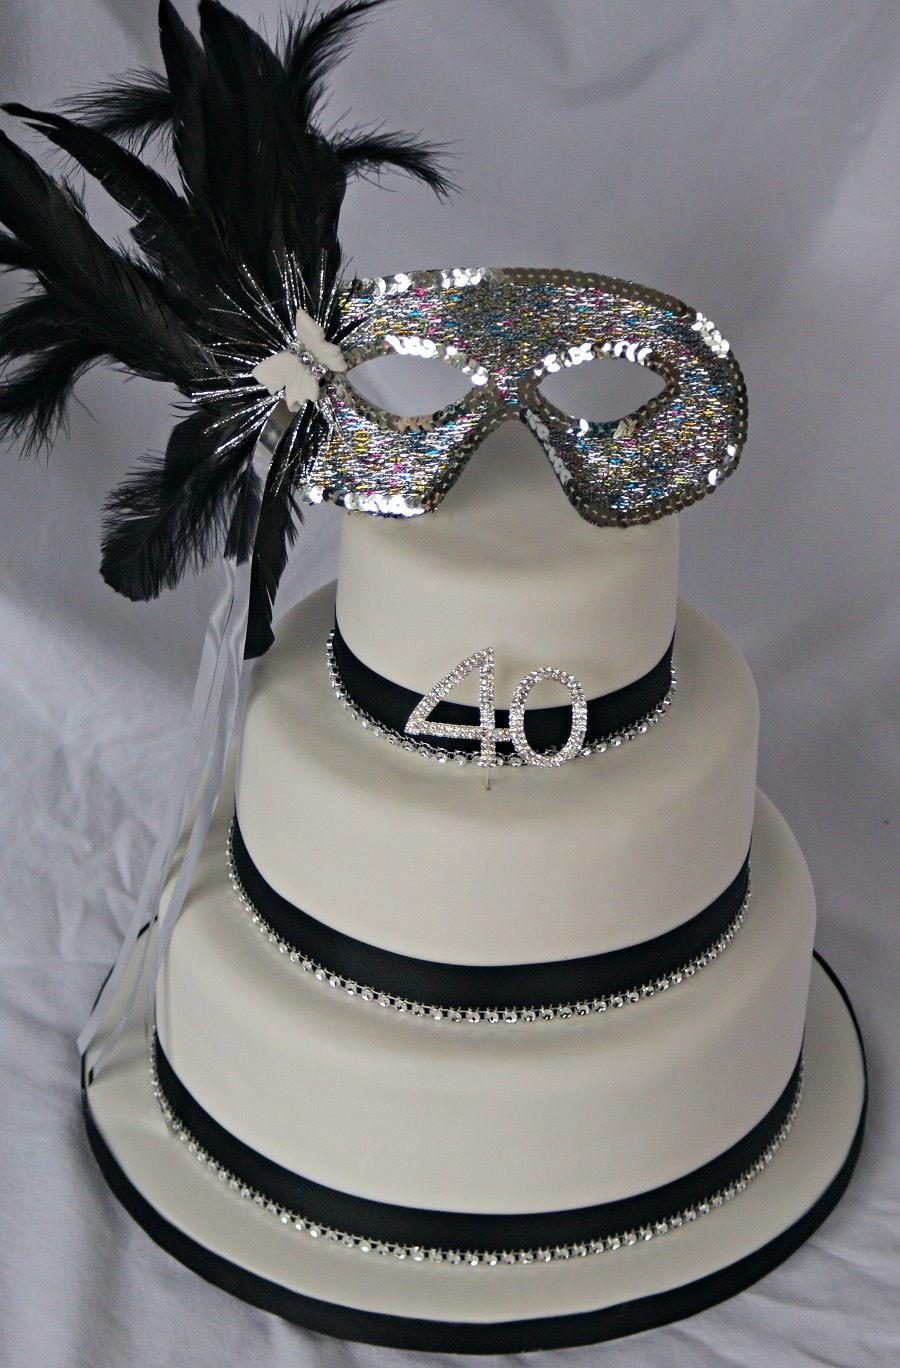 Masquerade Cake Masquerade Cakes Pinterest More